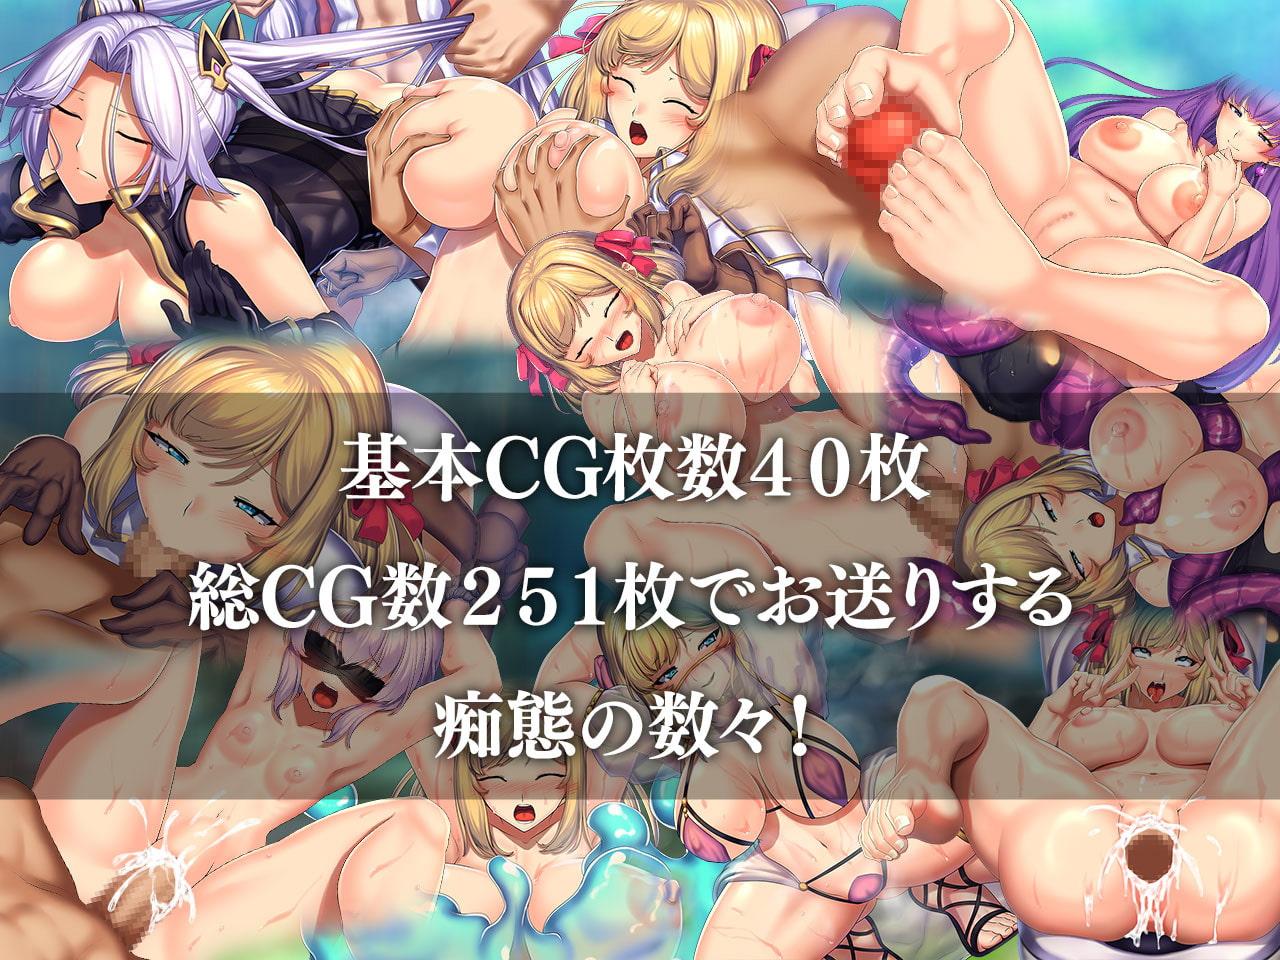 RJ302497 オプスキュリテ・マジー ~ 淫欲冒険者と王家の血 [20210326]